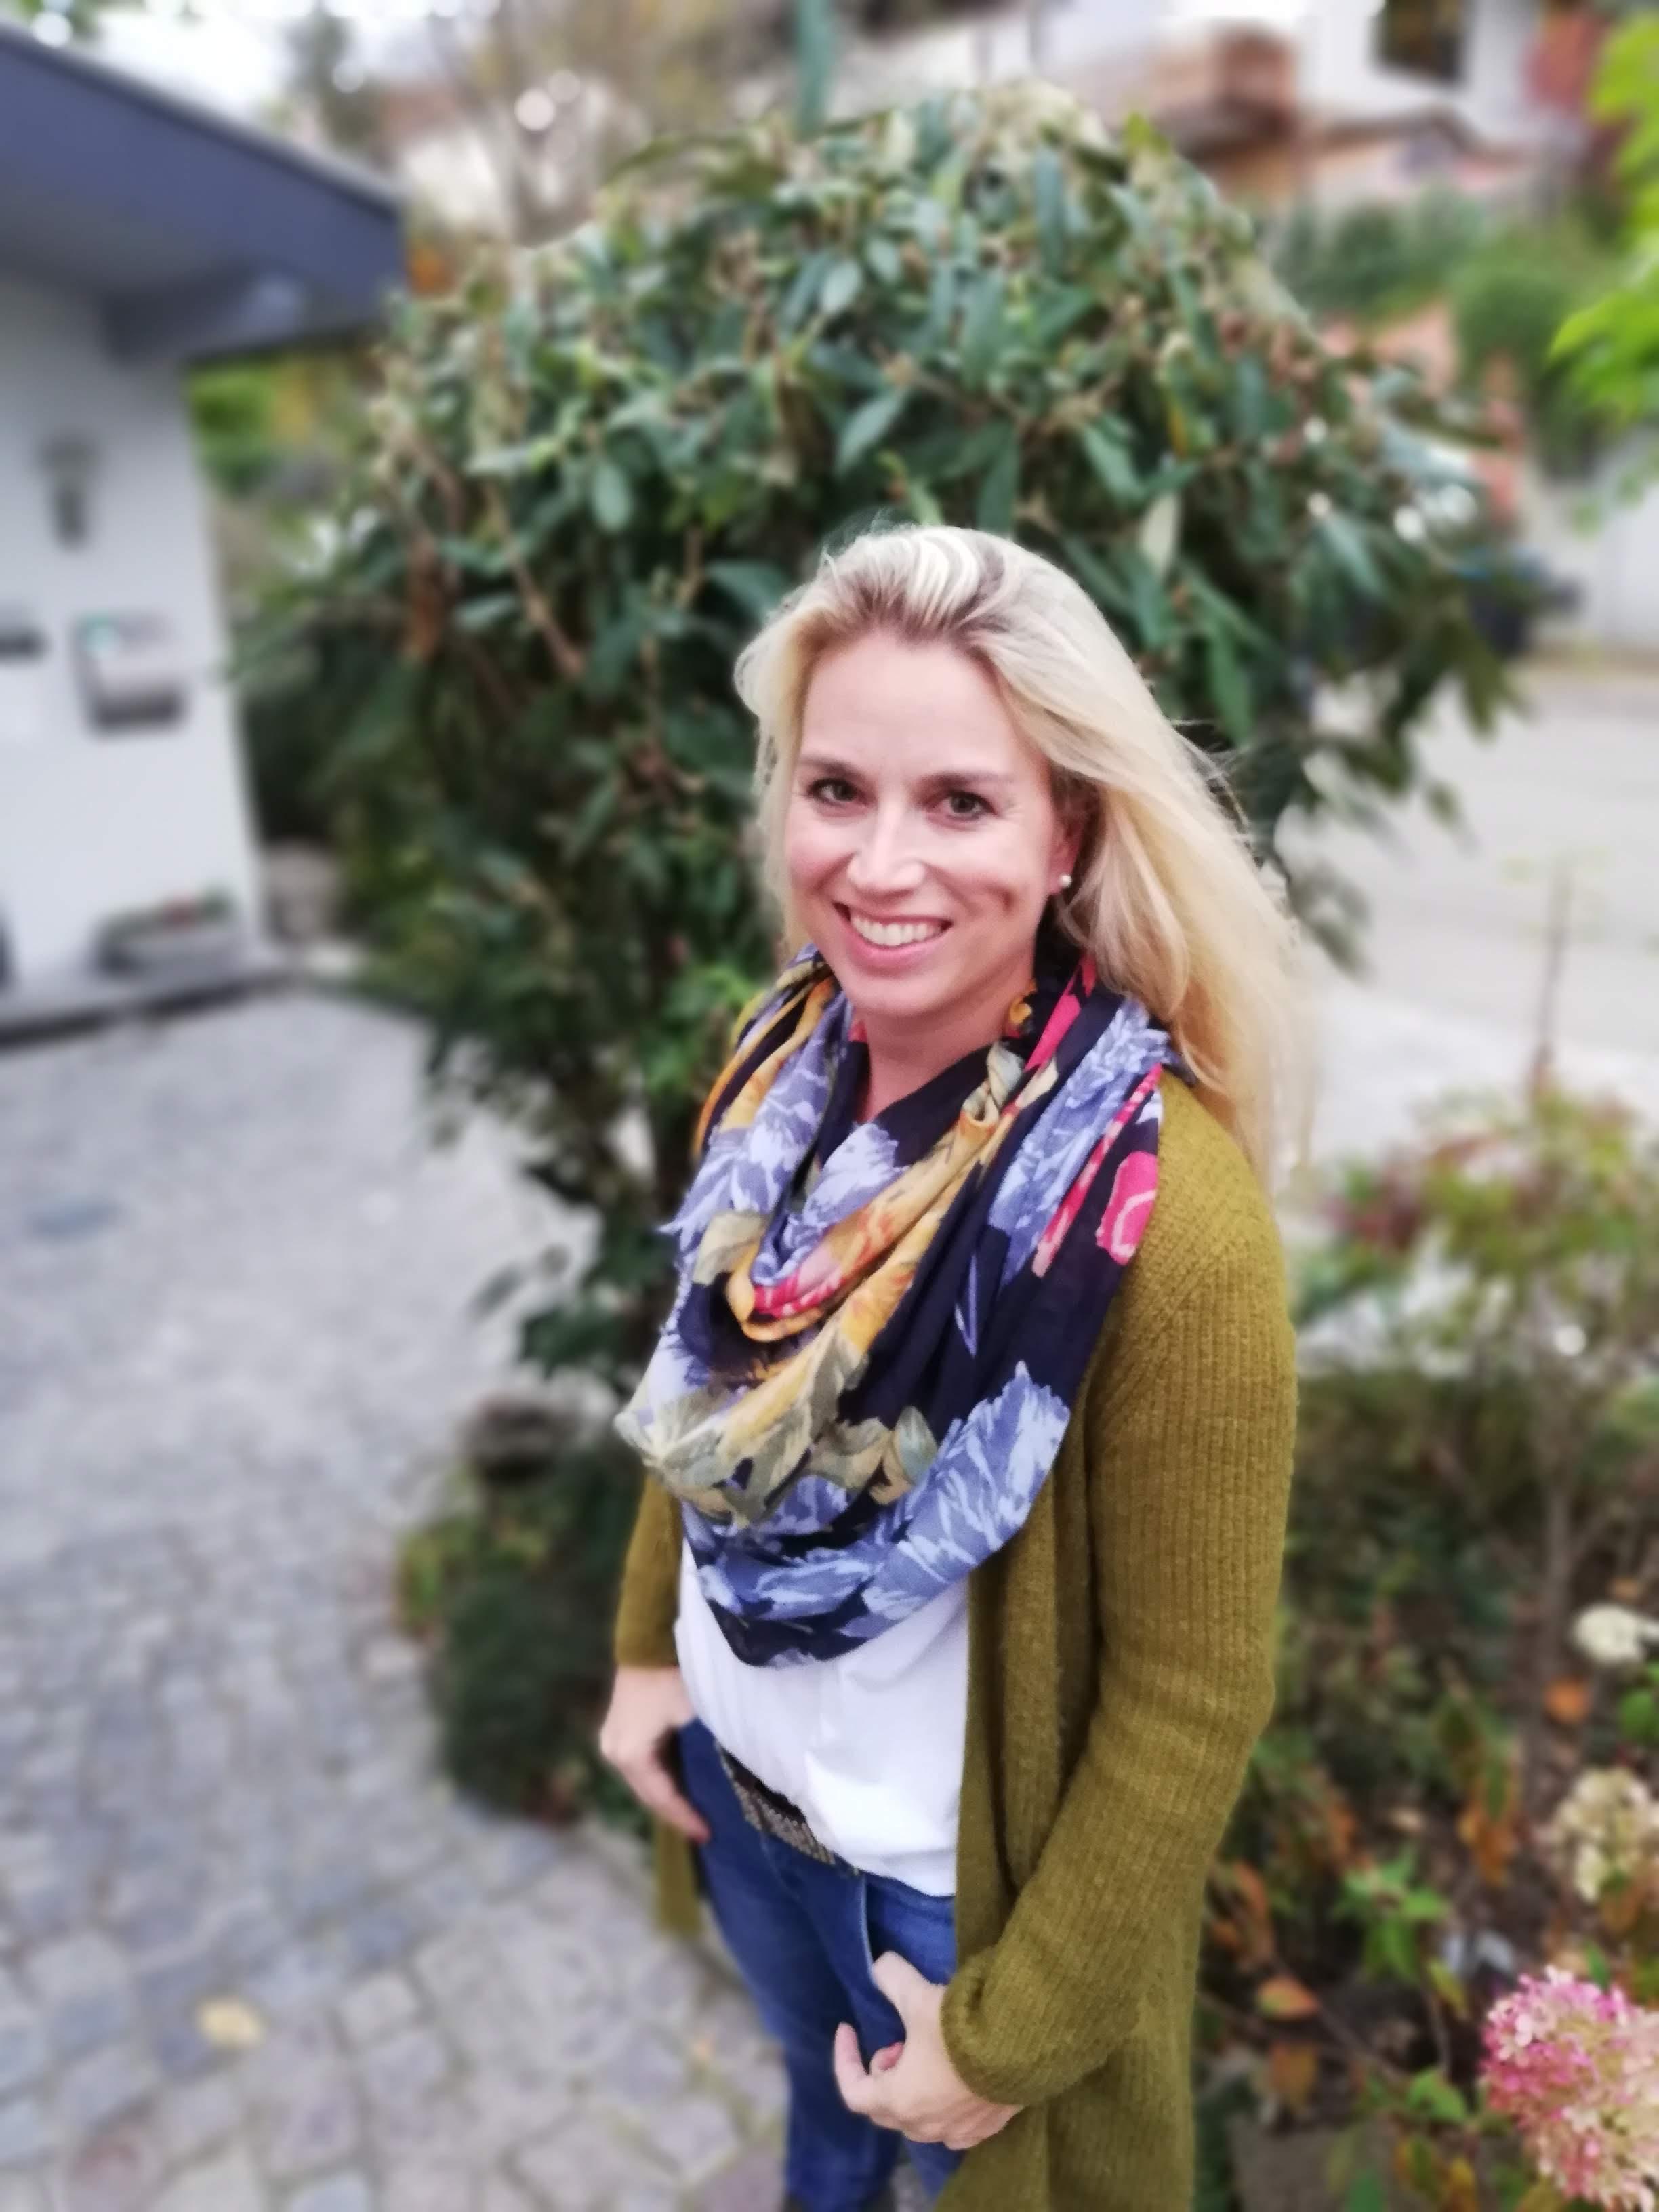 Susanne Brendler chilldochmama team